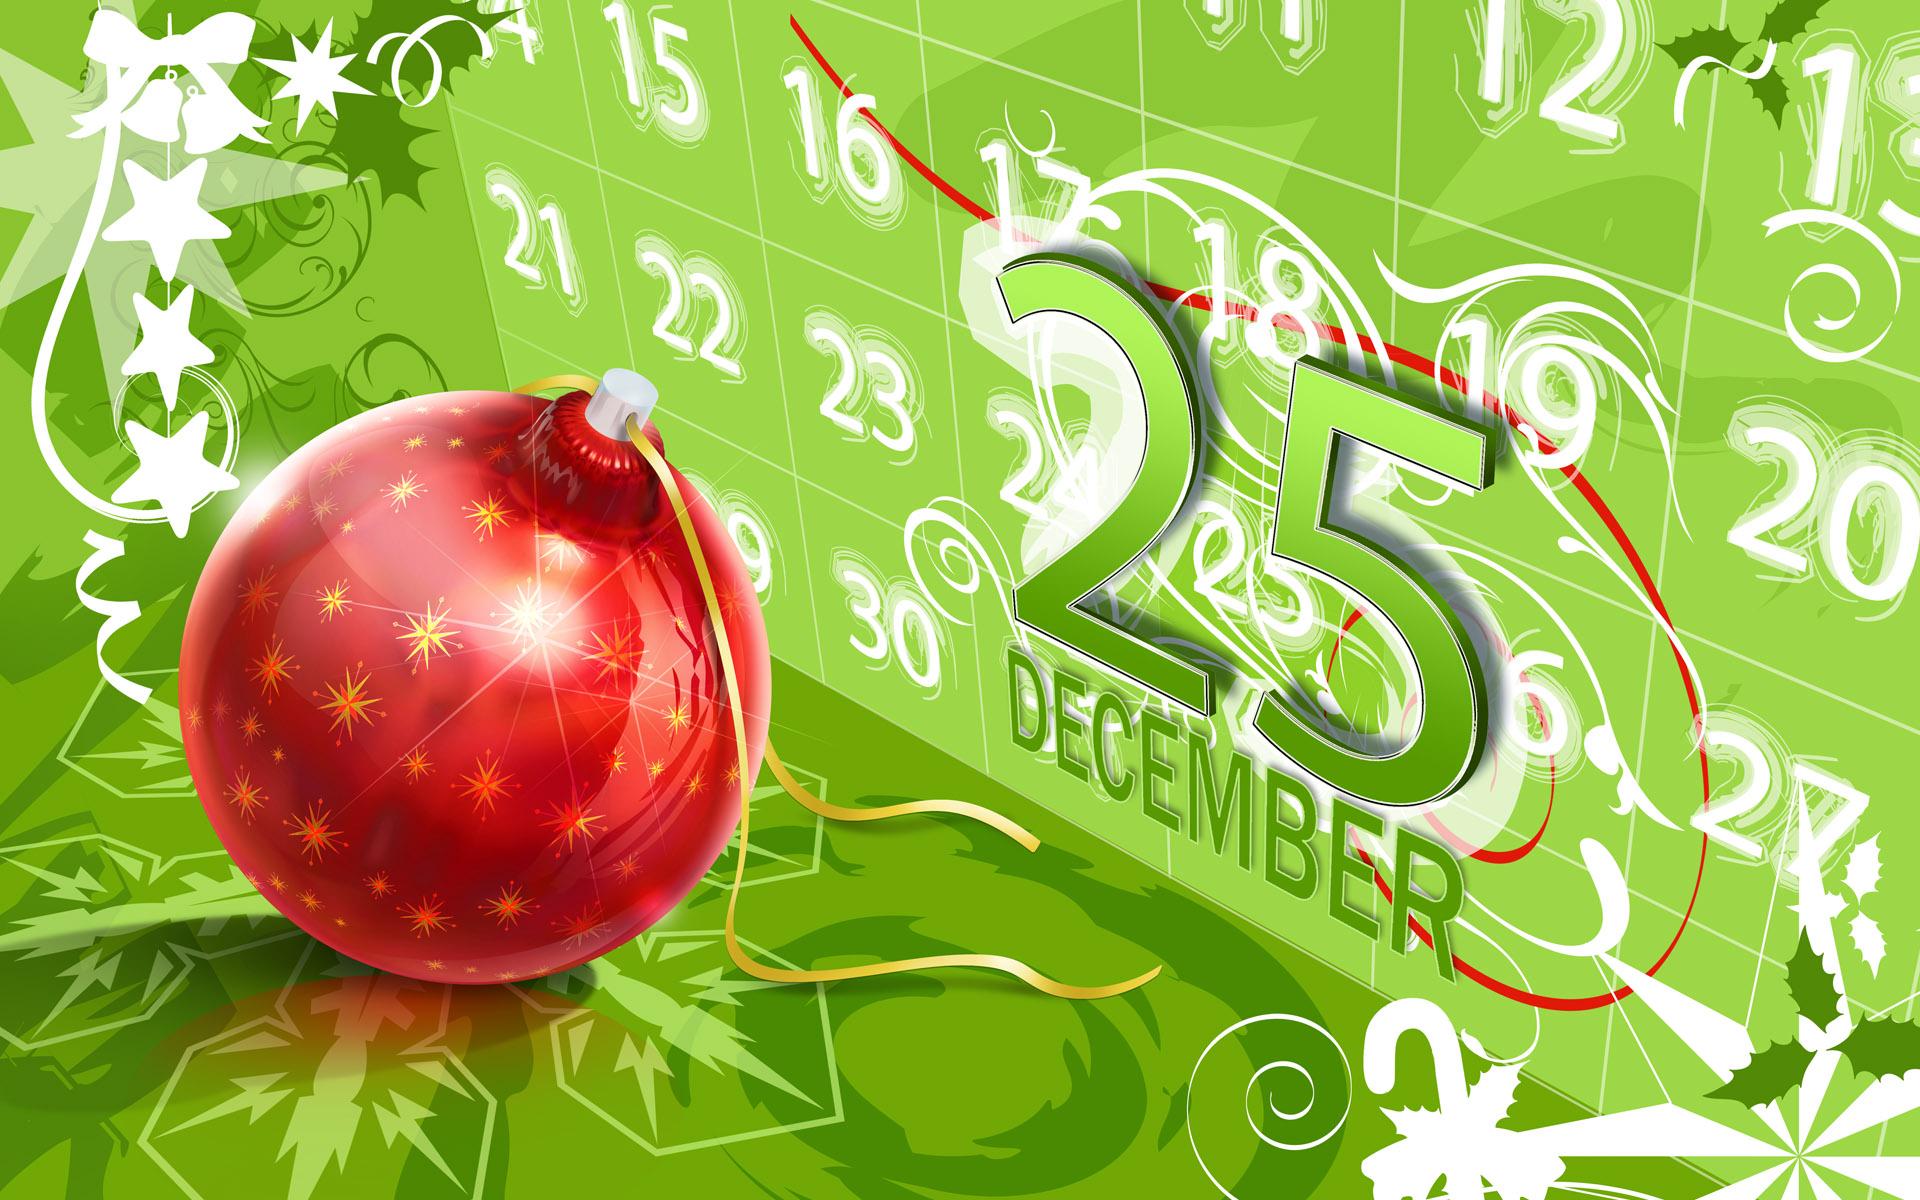 25 December Christmas